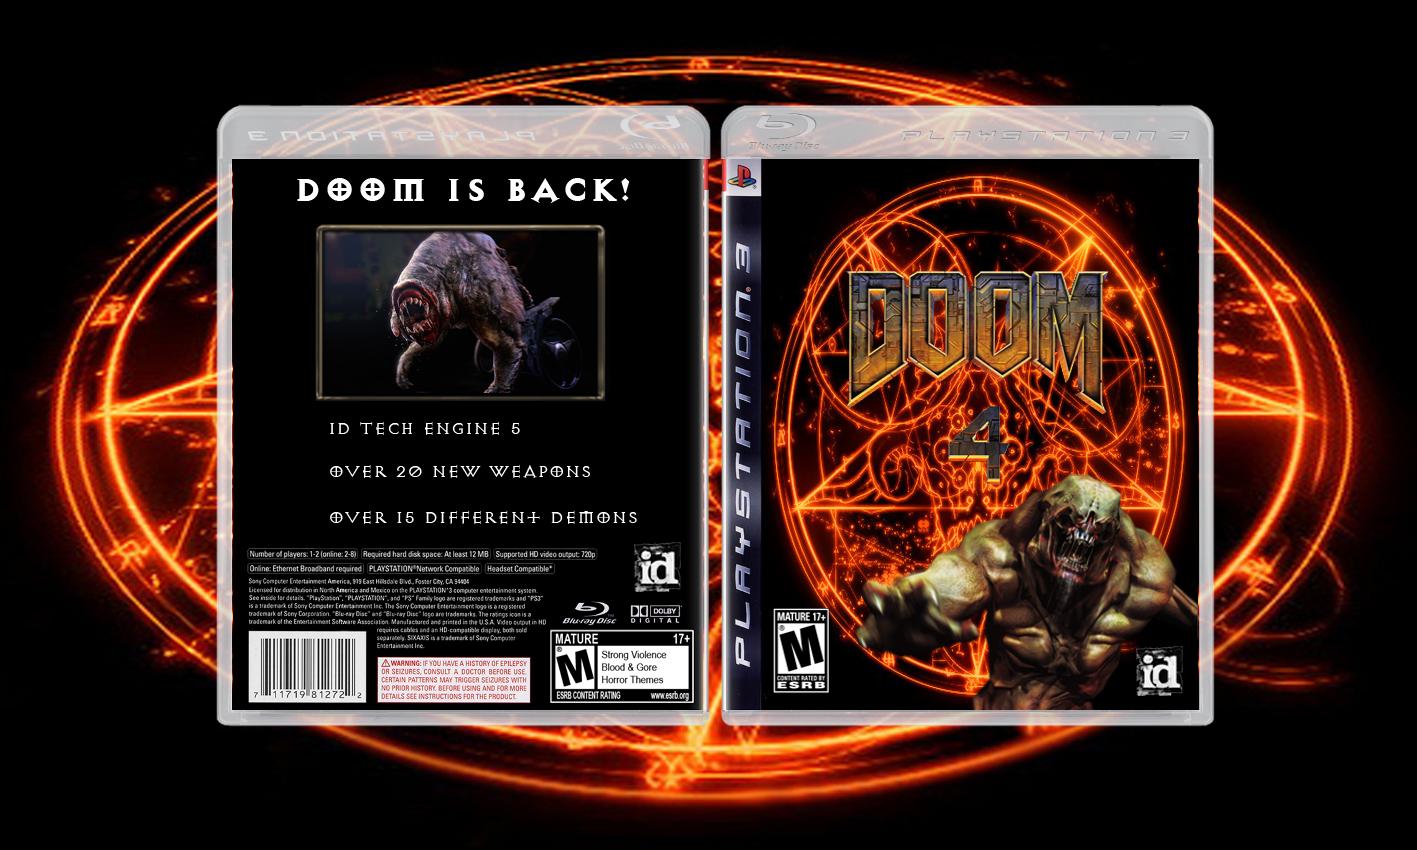 Doom 4 Ps3 Cover Concept Image EVILWEVIL Mod DB